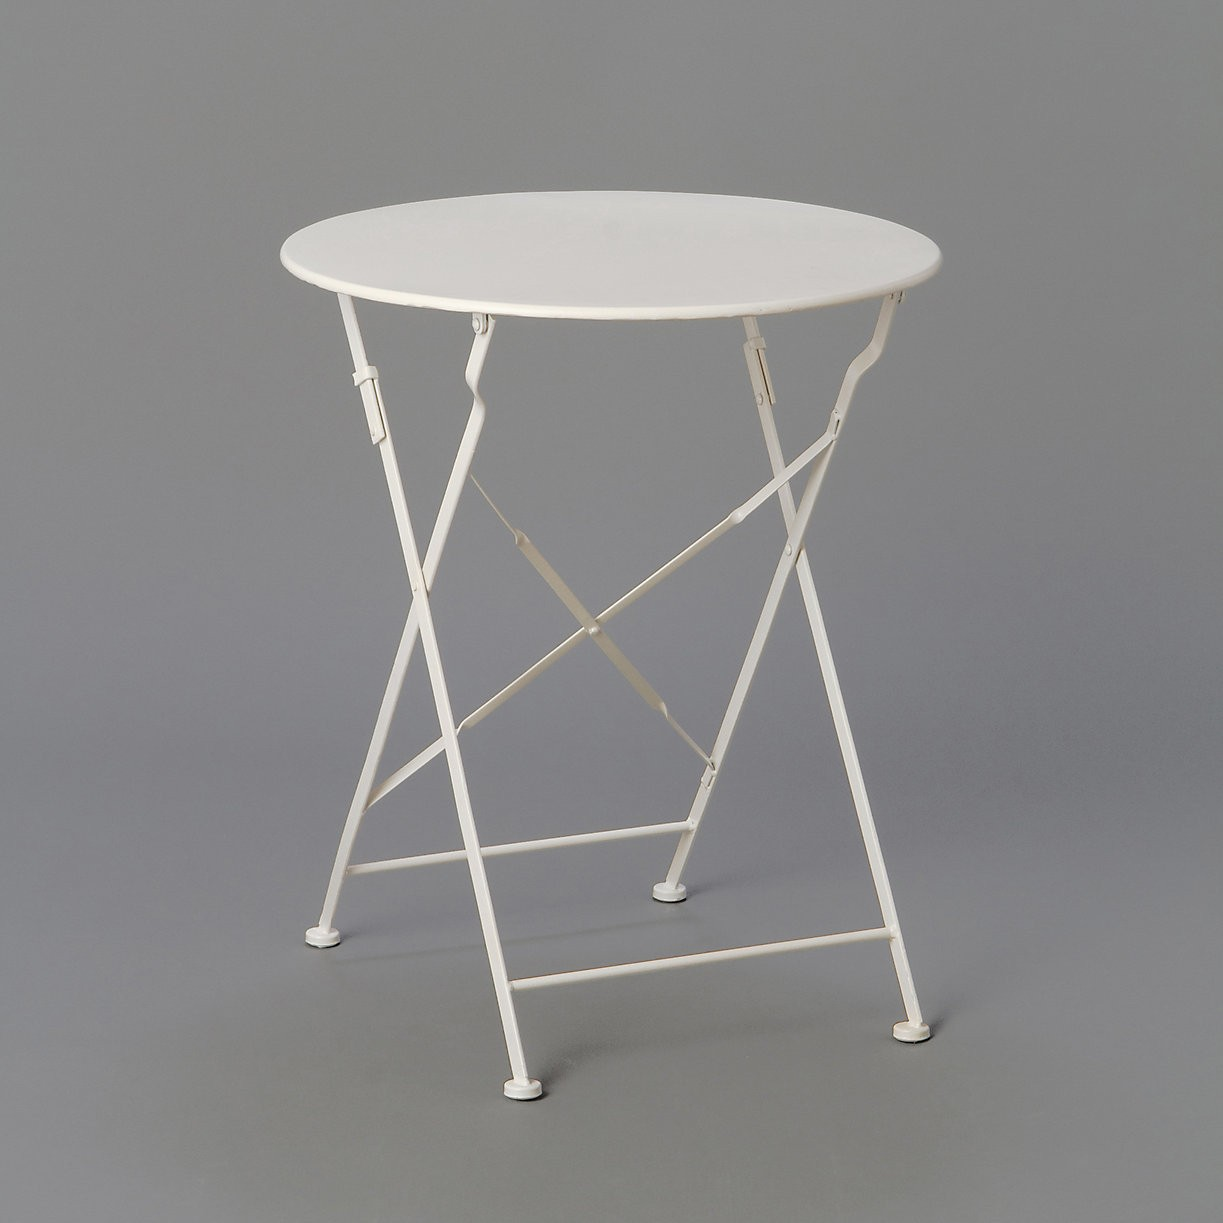 Merveilleux Bistro Table For Sale 3